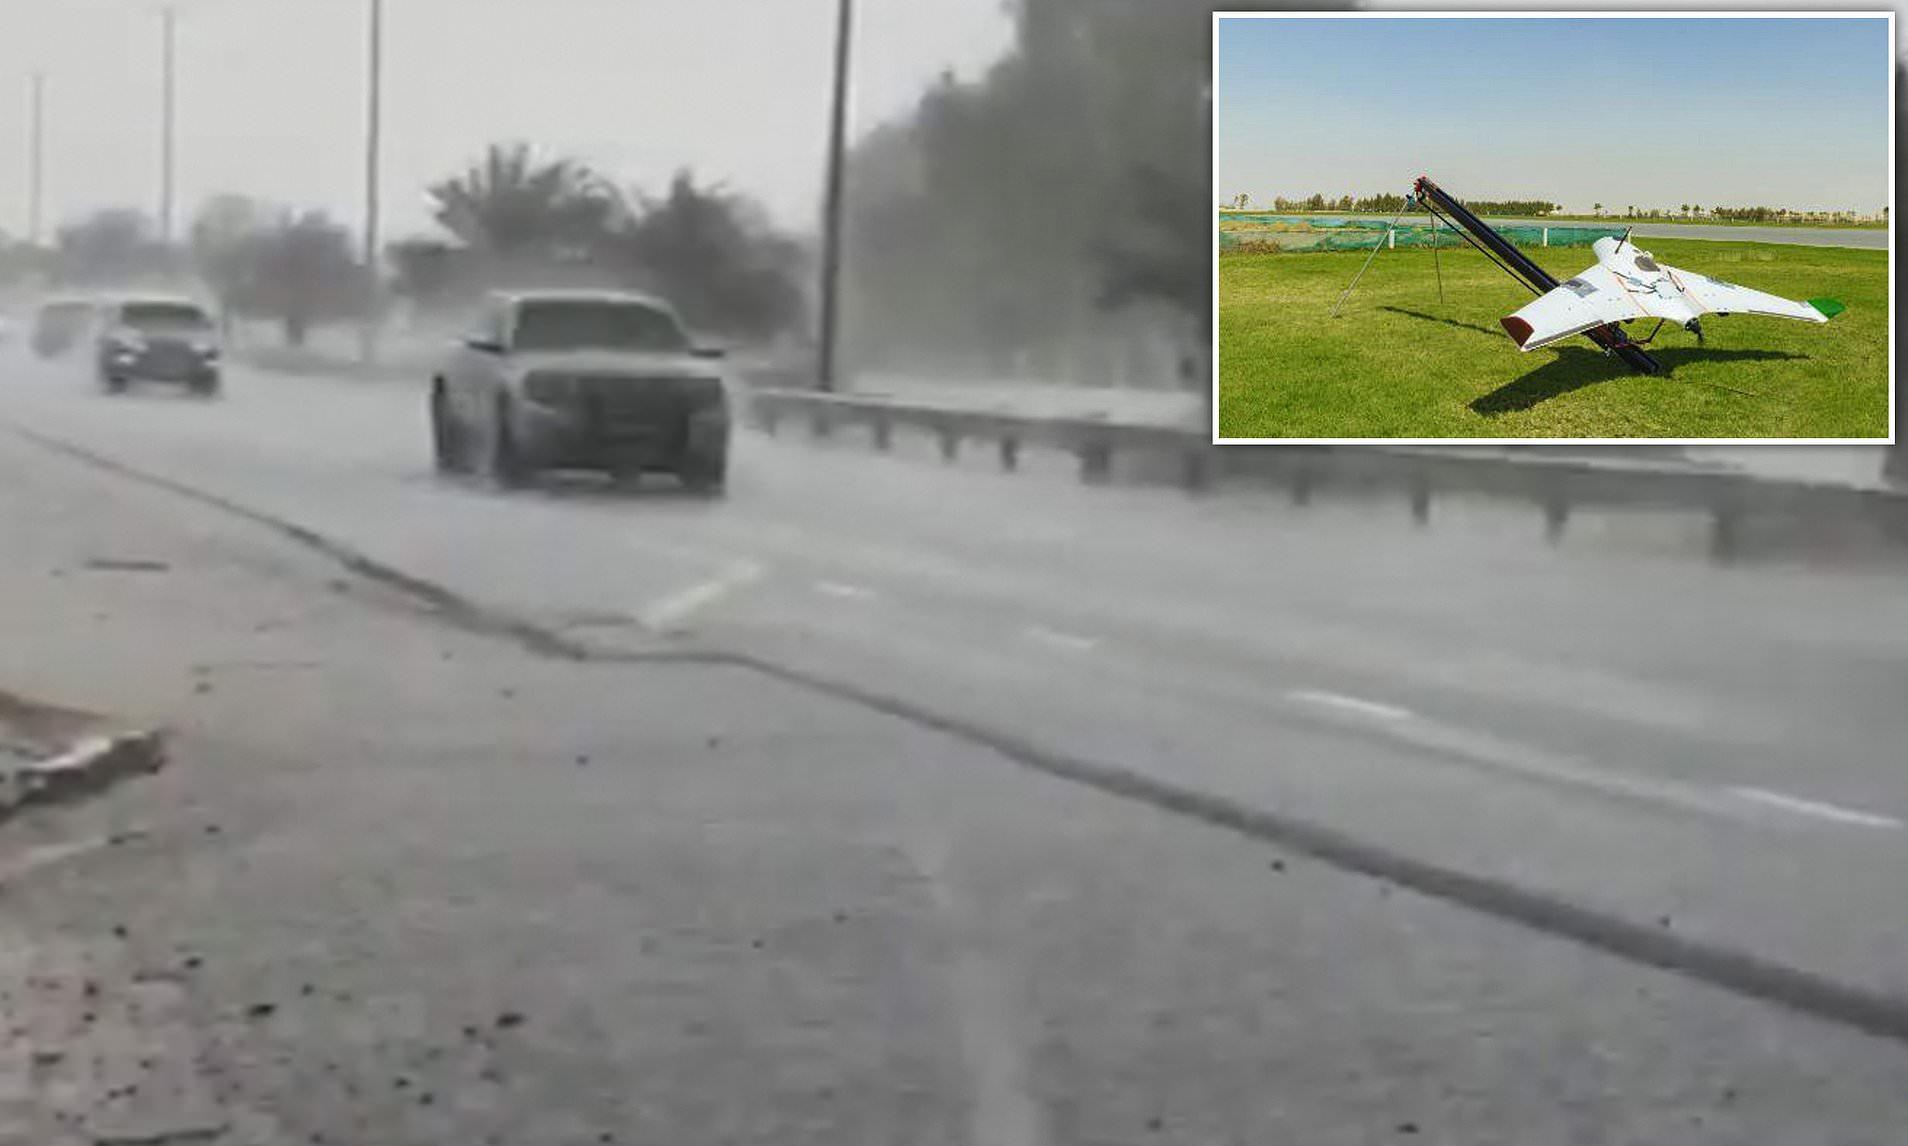 Artificial Rain in Dubai Using Drone Technology to Fight 50°C Heat